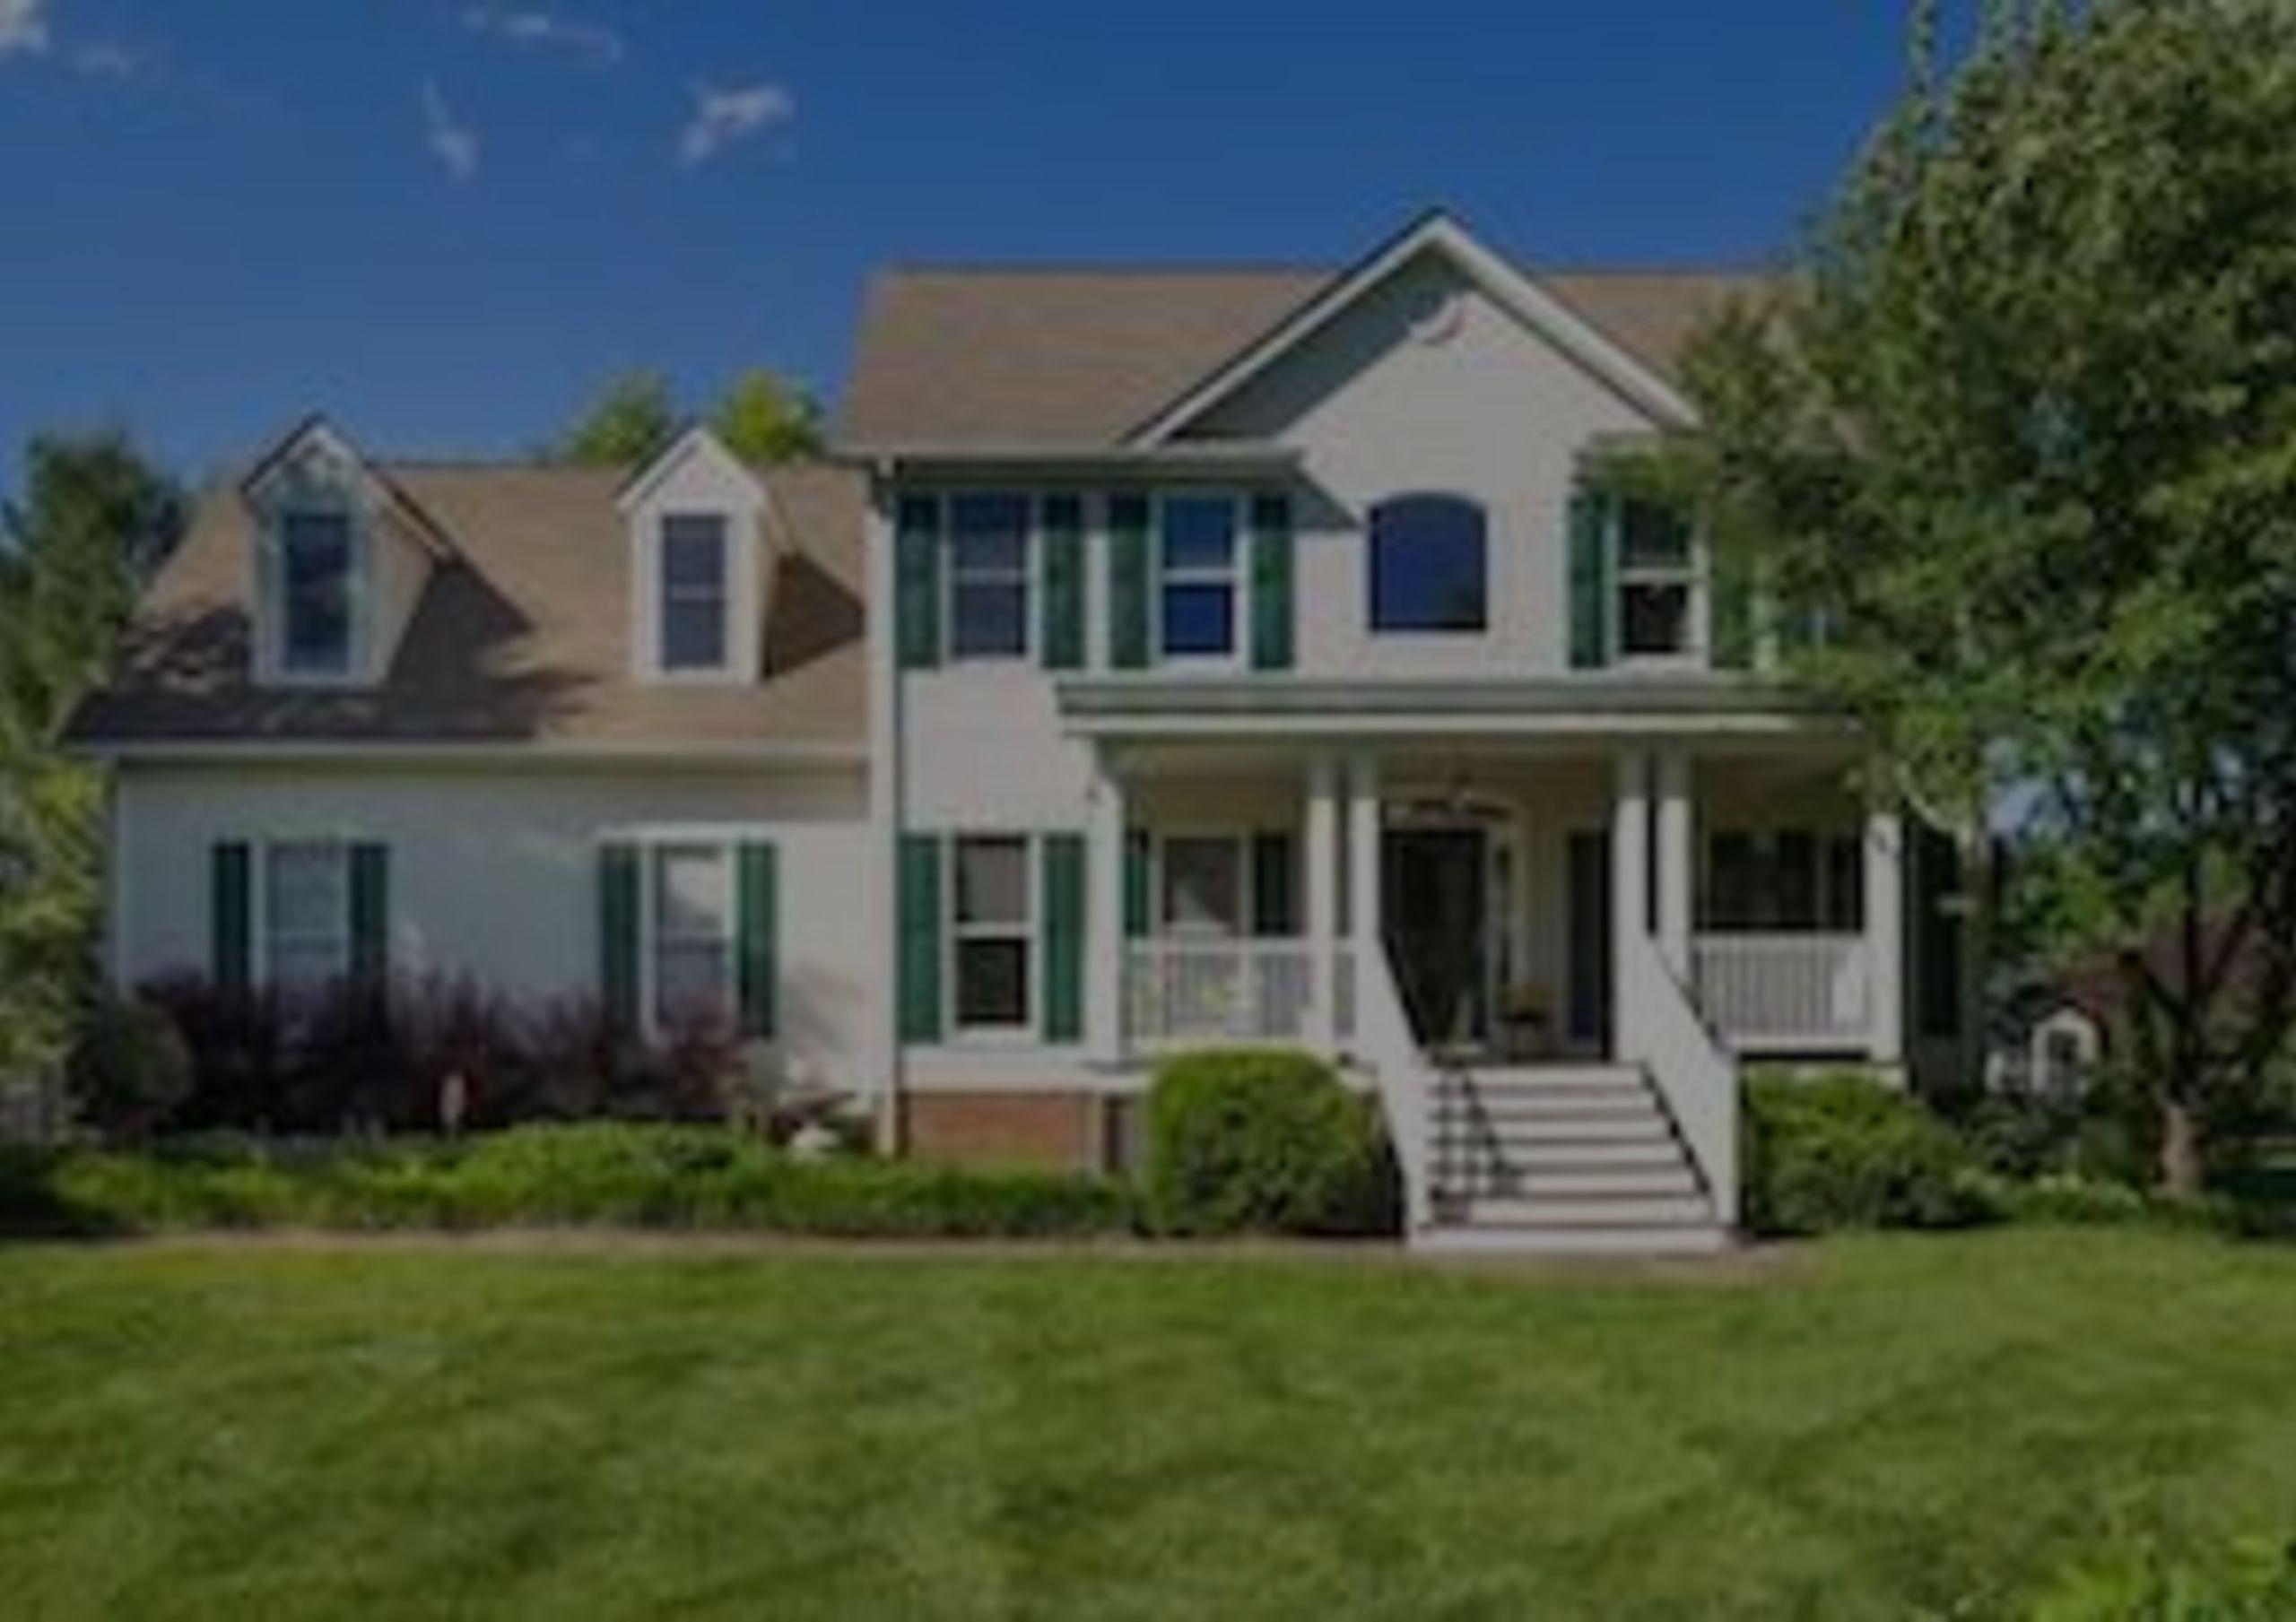 OPEN HOUSES | 7/22 & 23 in Clarke & Fairfax